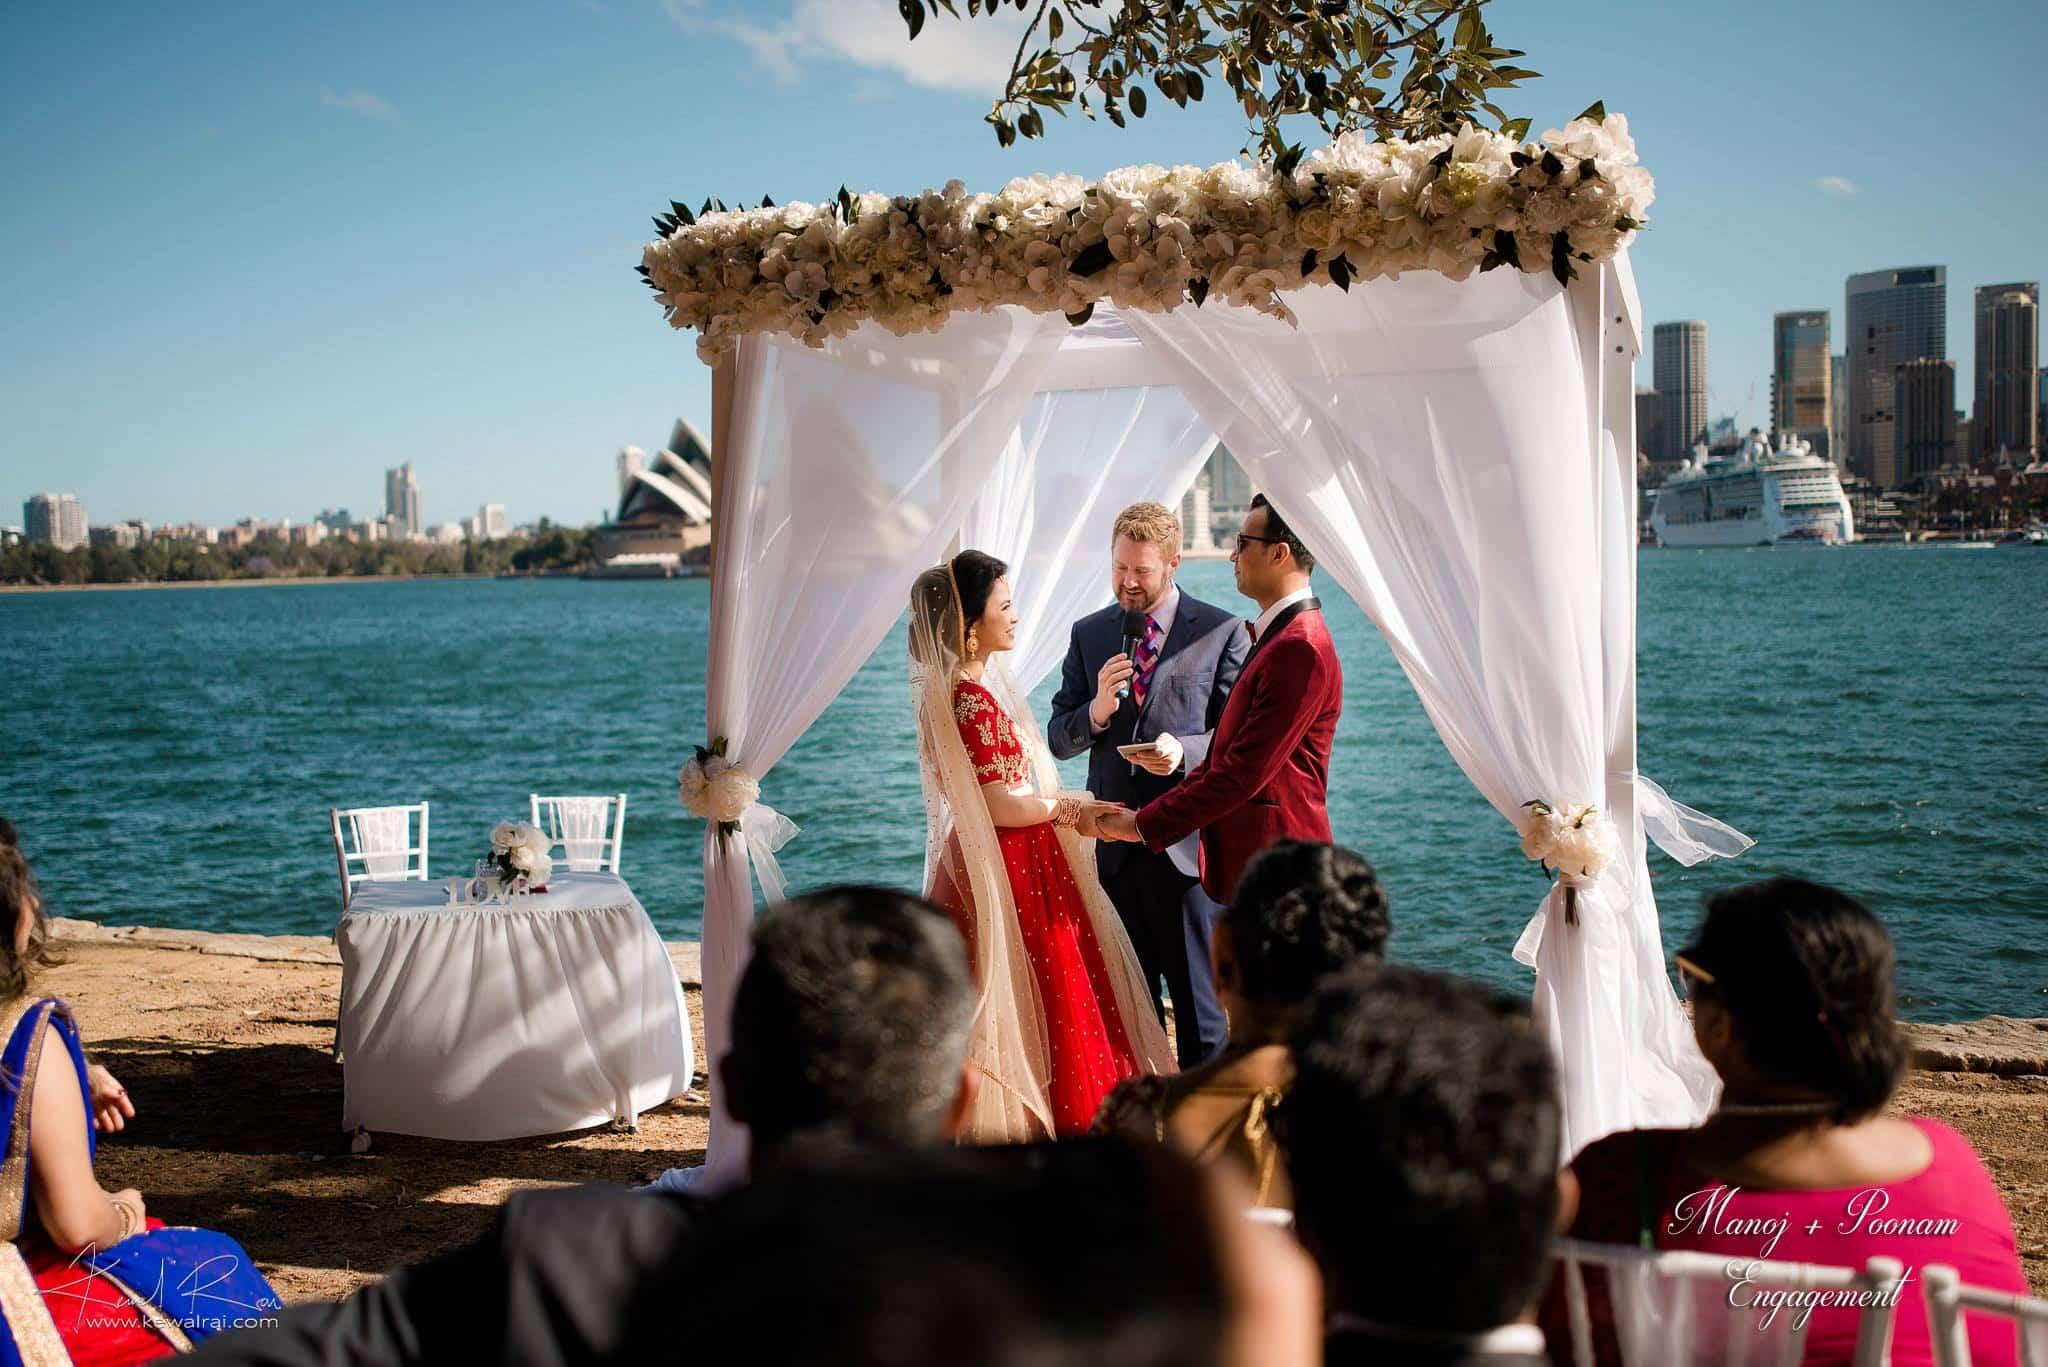 Sydney Harbour Wedding - Stephen Lee Sydney Marriage Celebrant